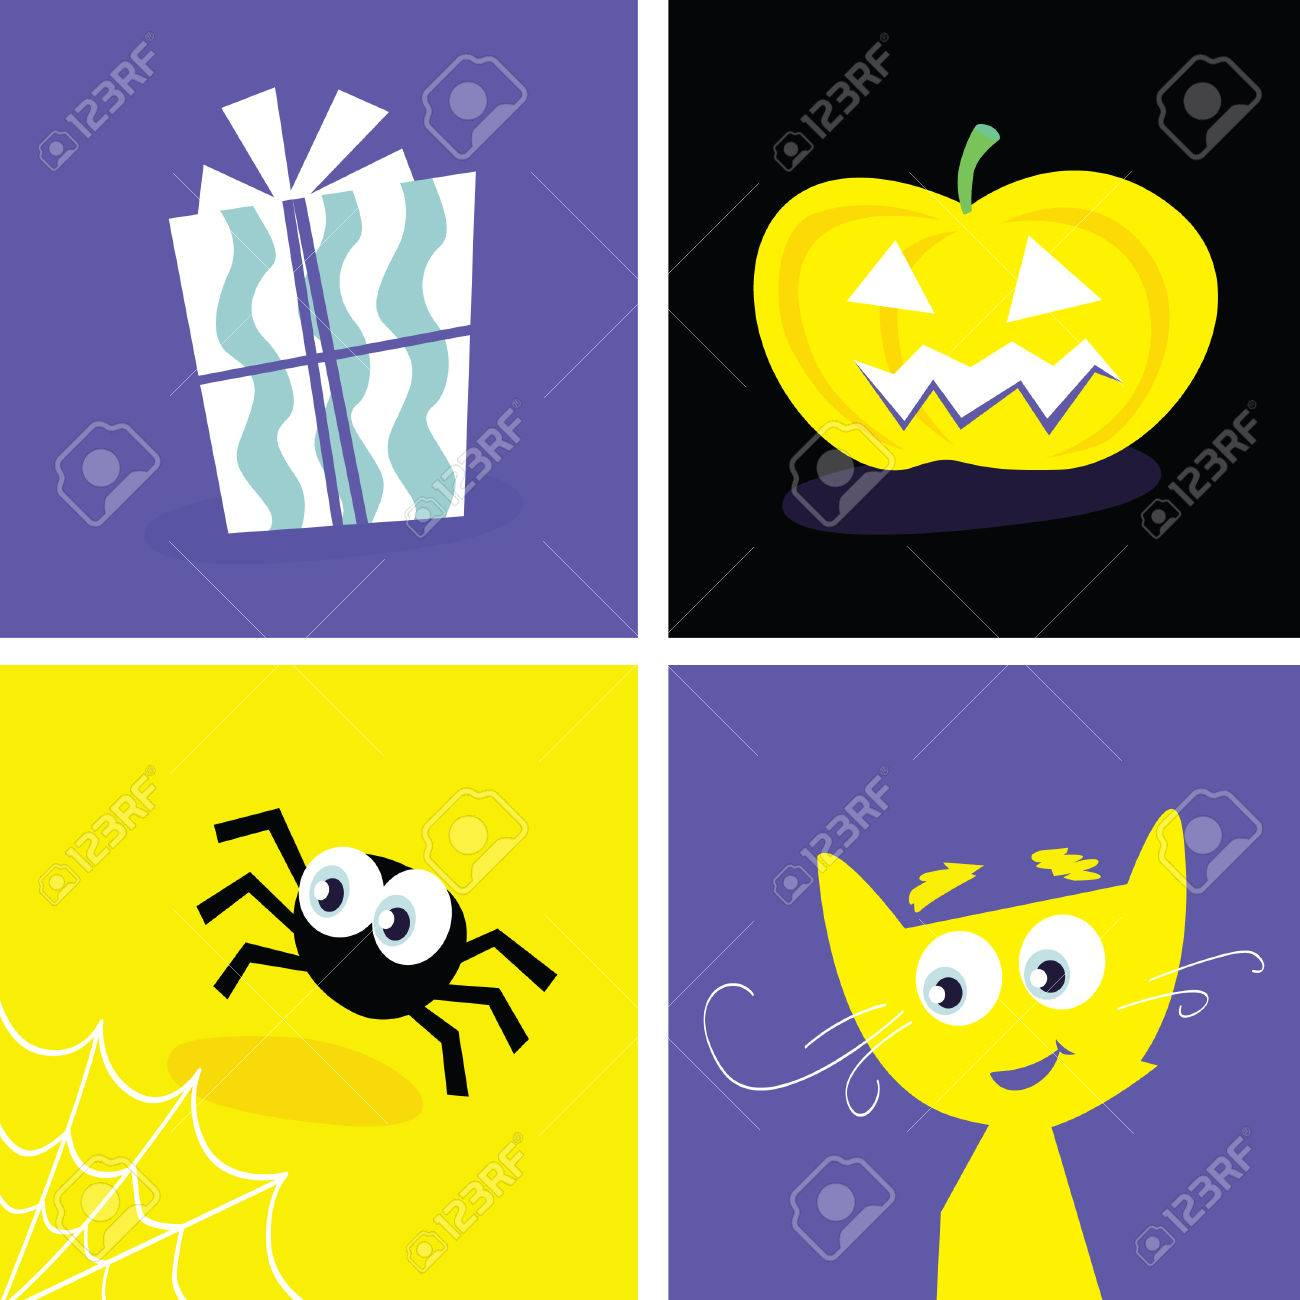 Halloween retro icons. Halloween vector Iconset. Series included symbols of halloween present, cat, pumpkin head and spider. Stock Vector - 5612323